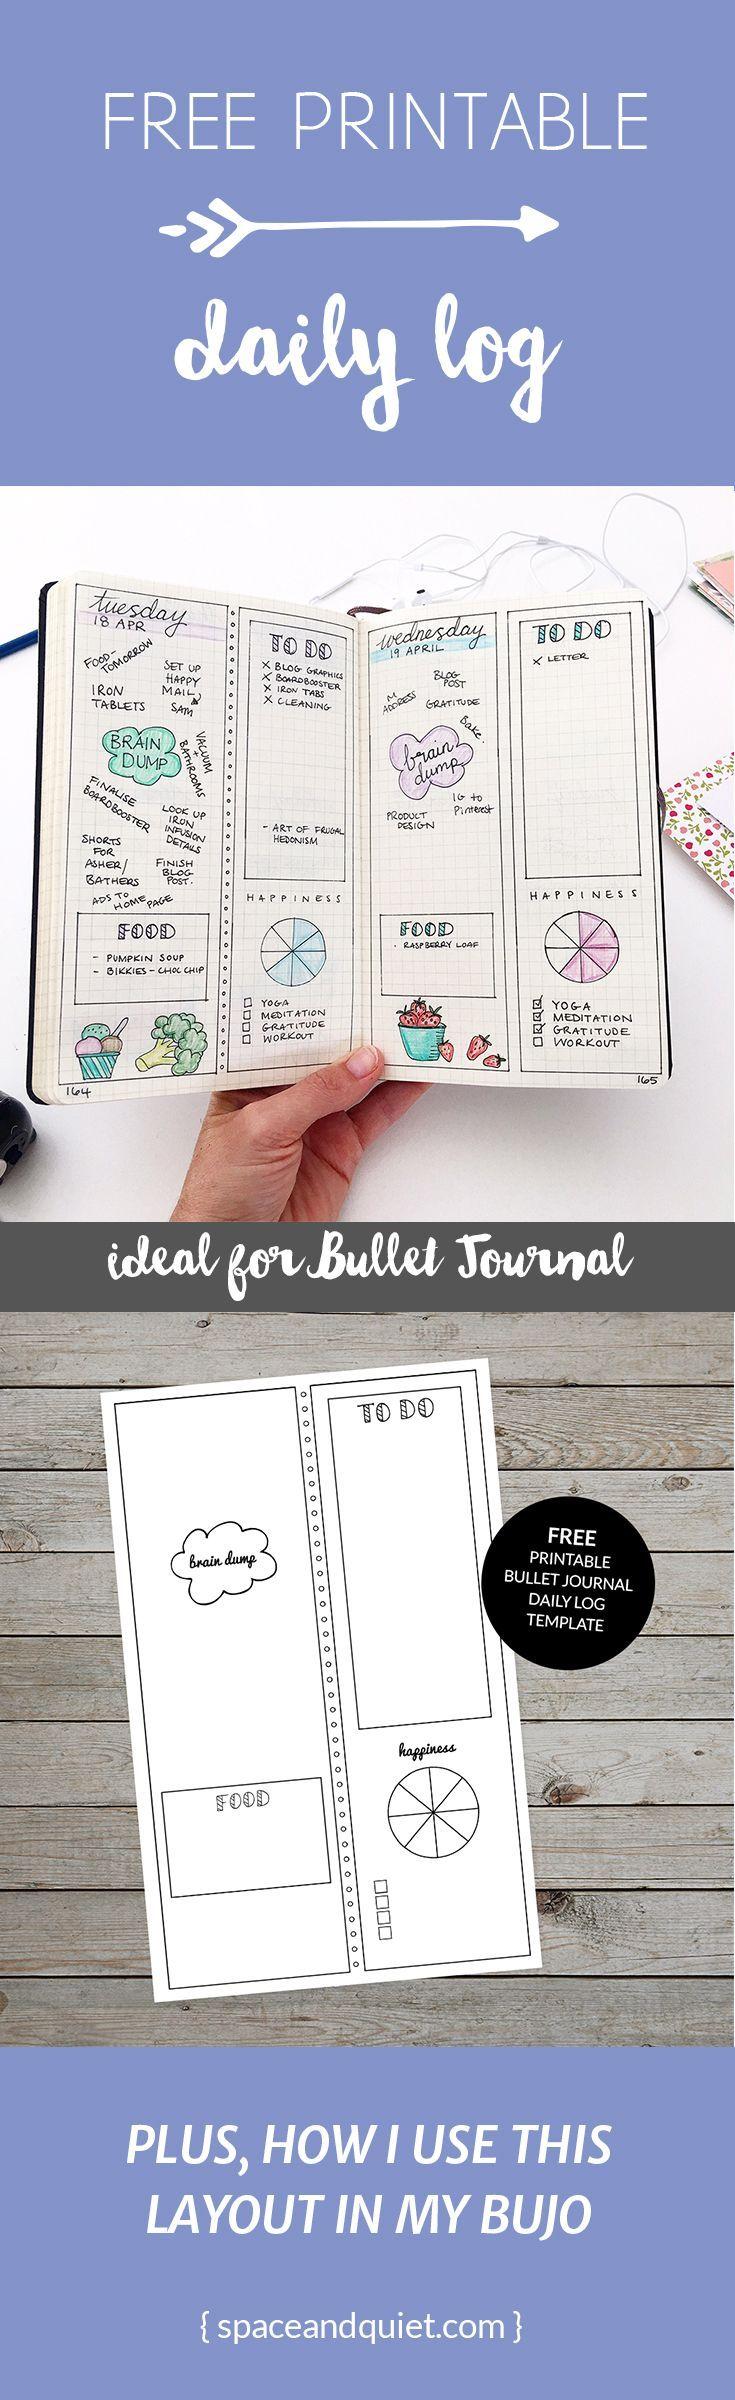 Printable Bullet Journal Daily Log Template